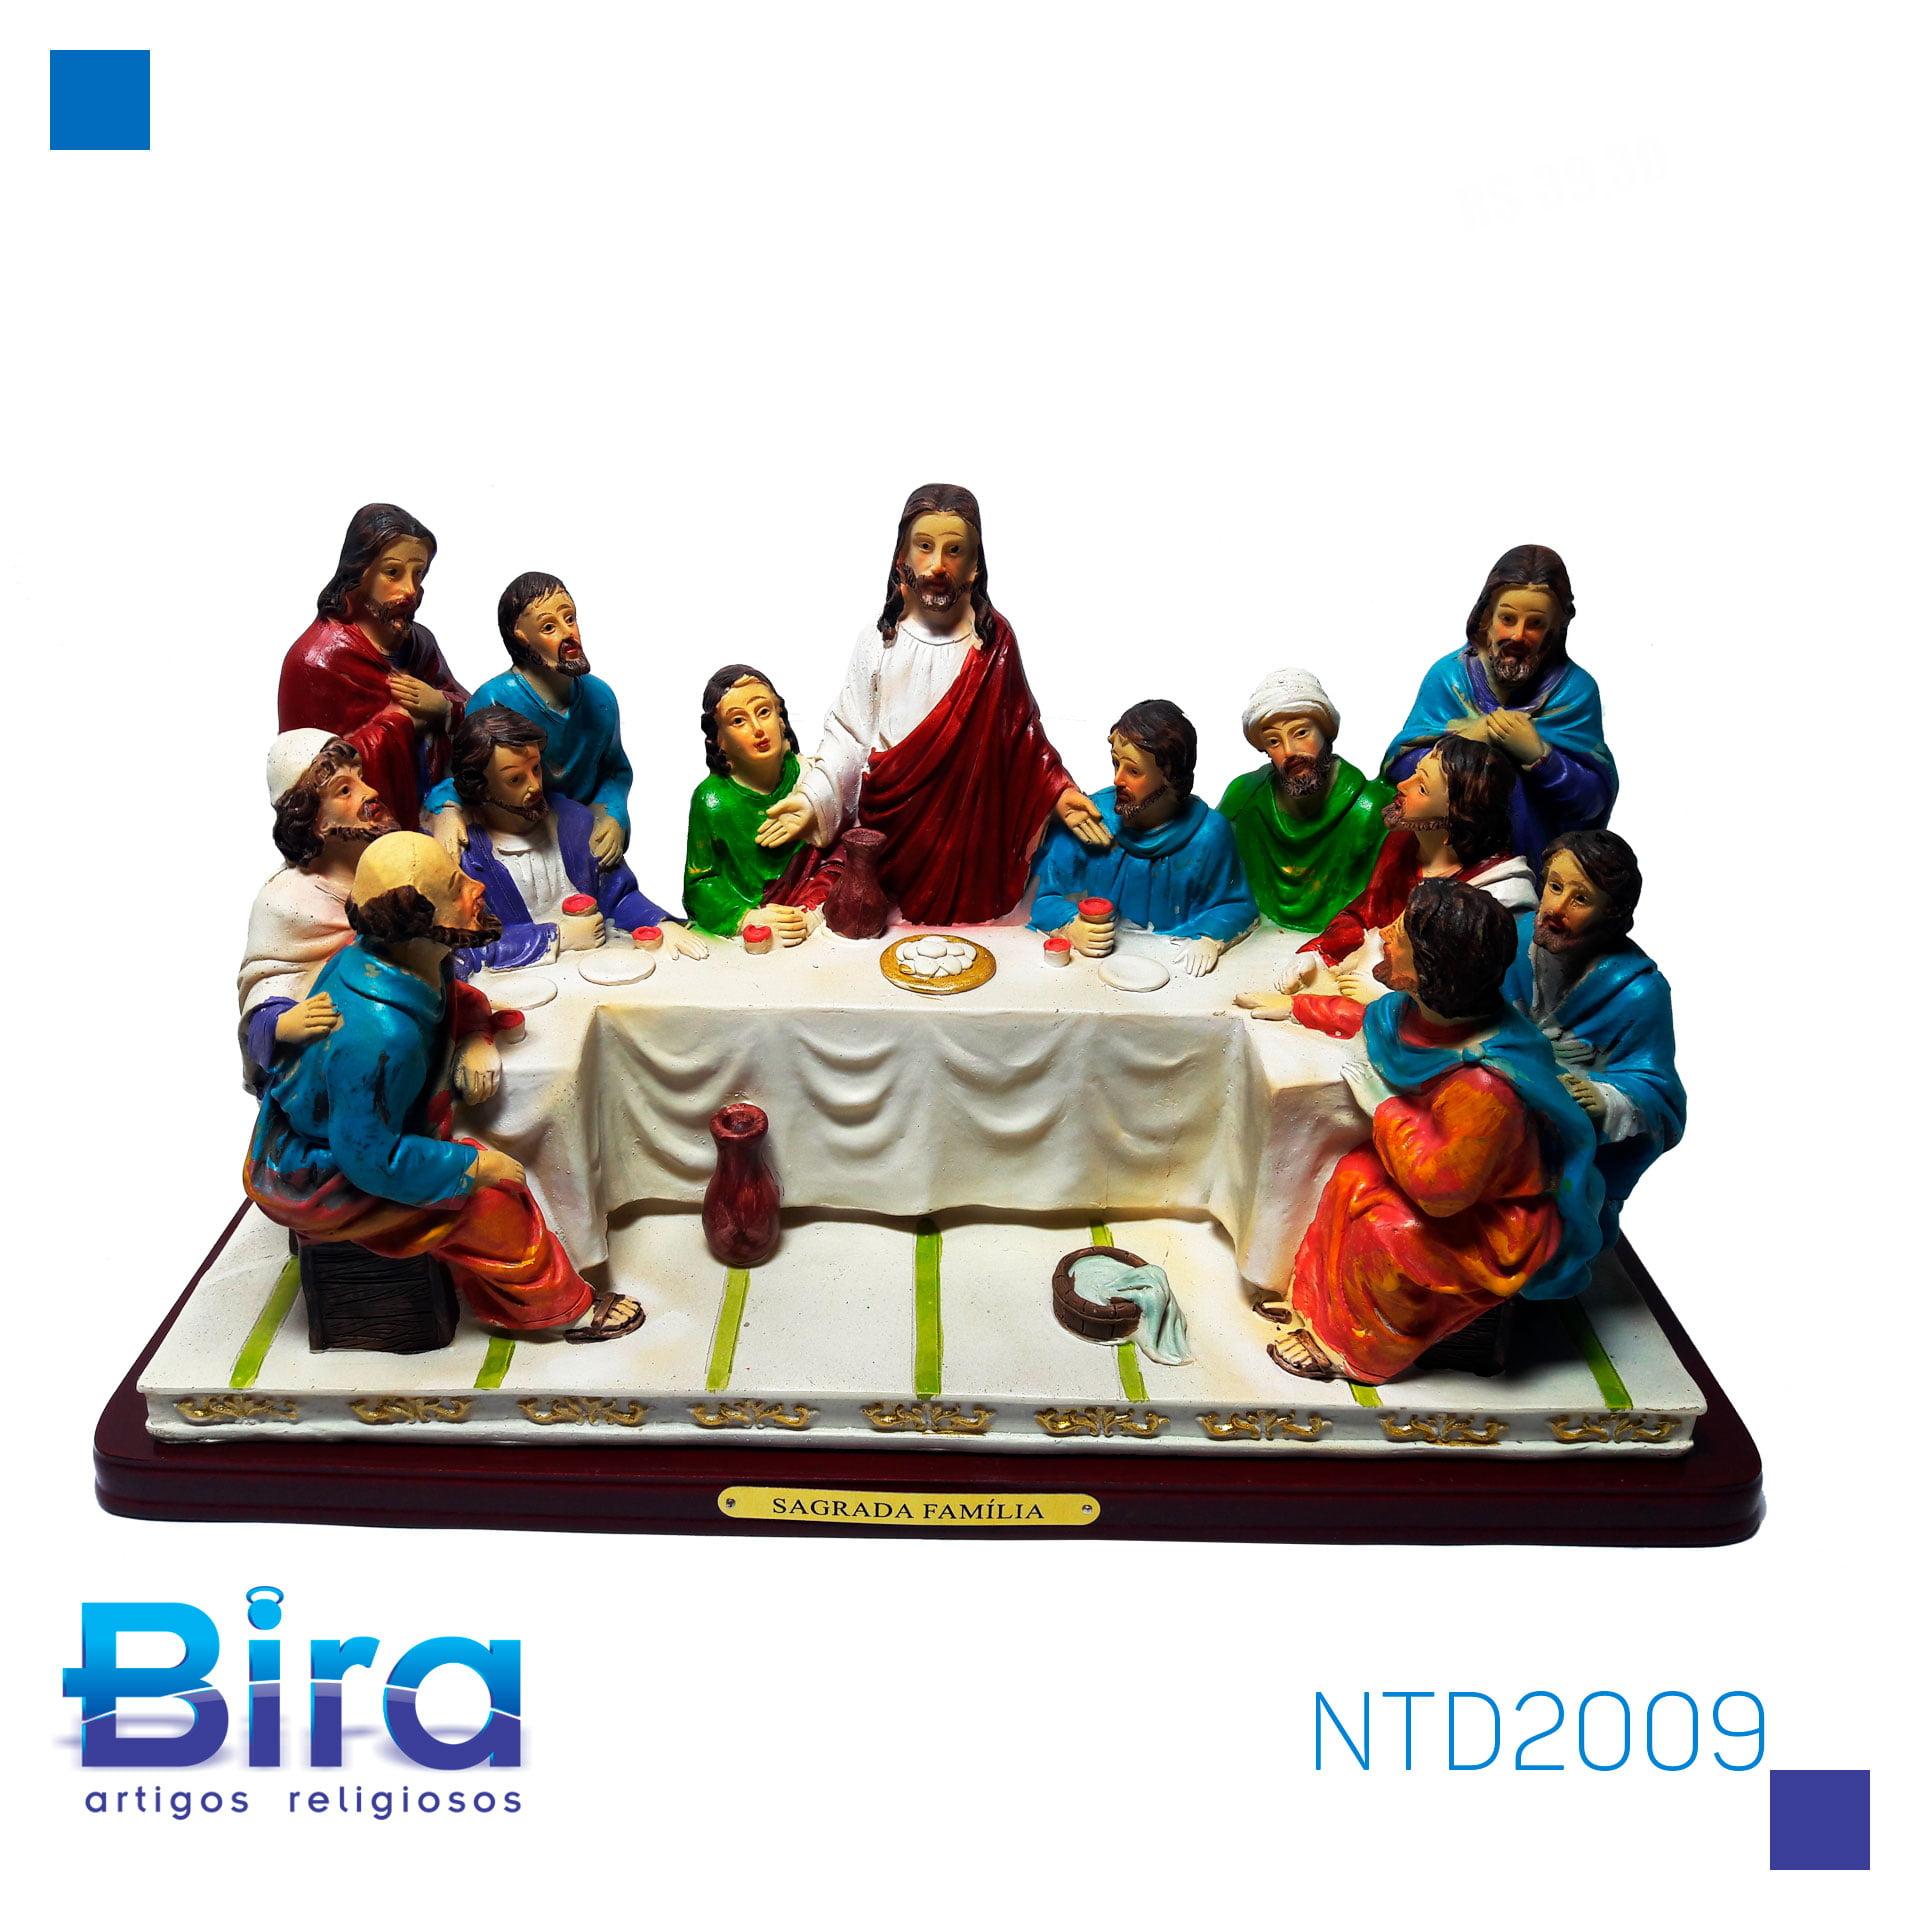 Bira Artigos Religiosos - SANTA CEIA  DE   32 X 17 CM - CÓD. NTD2009